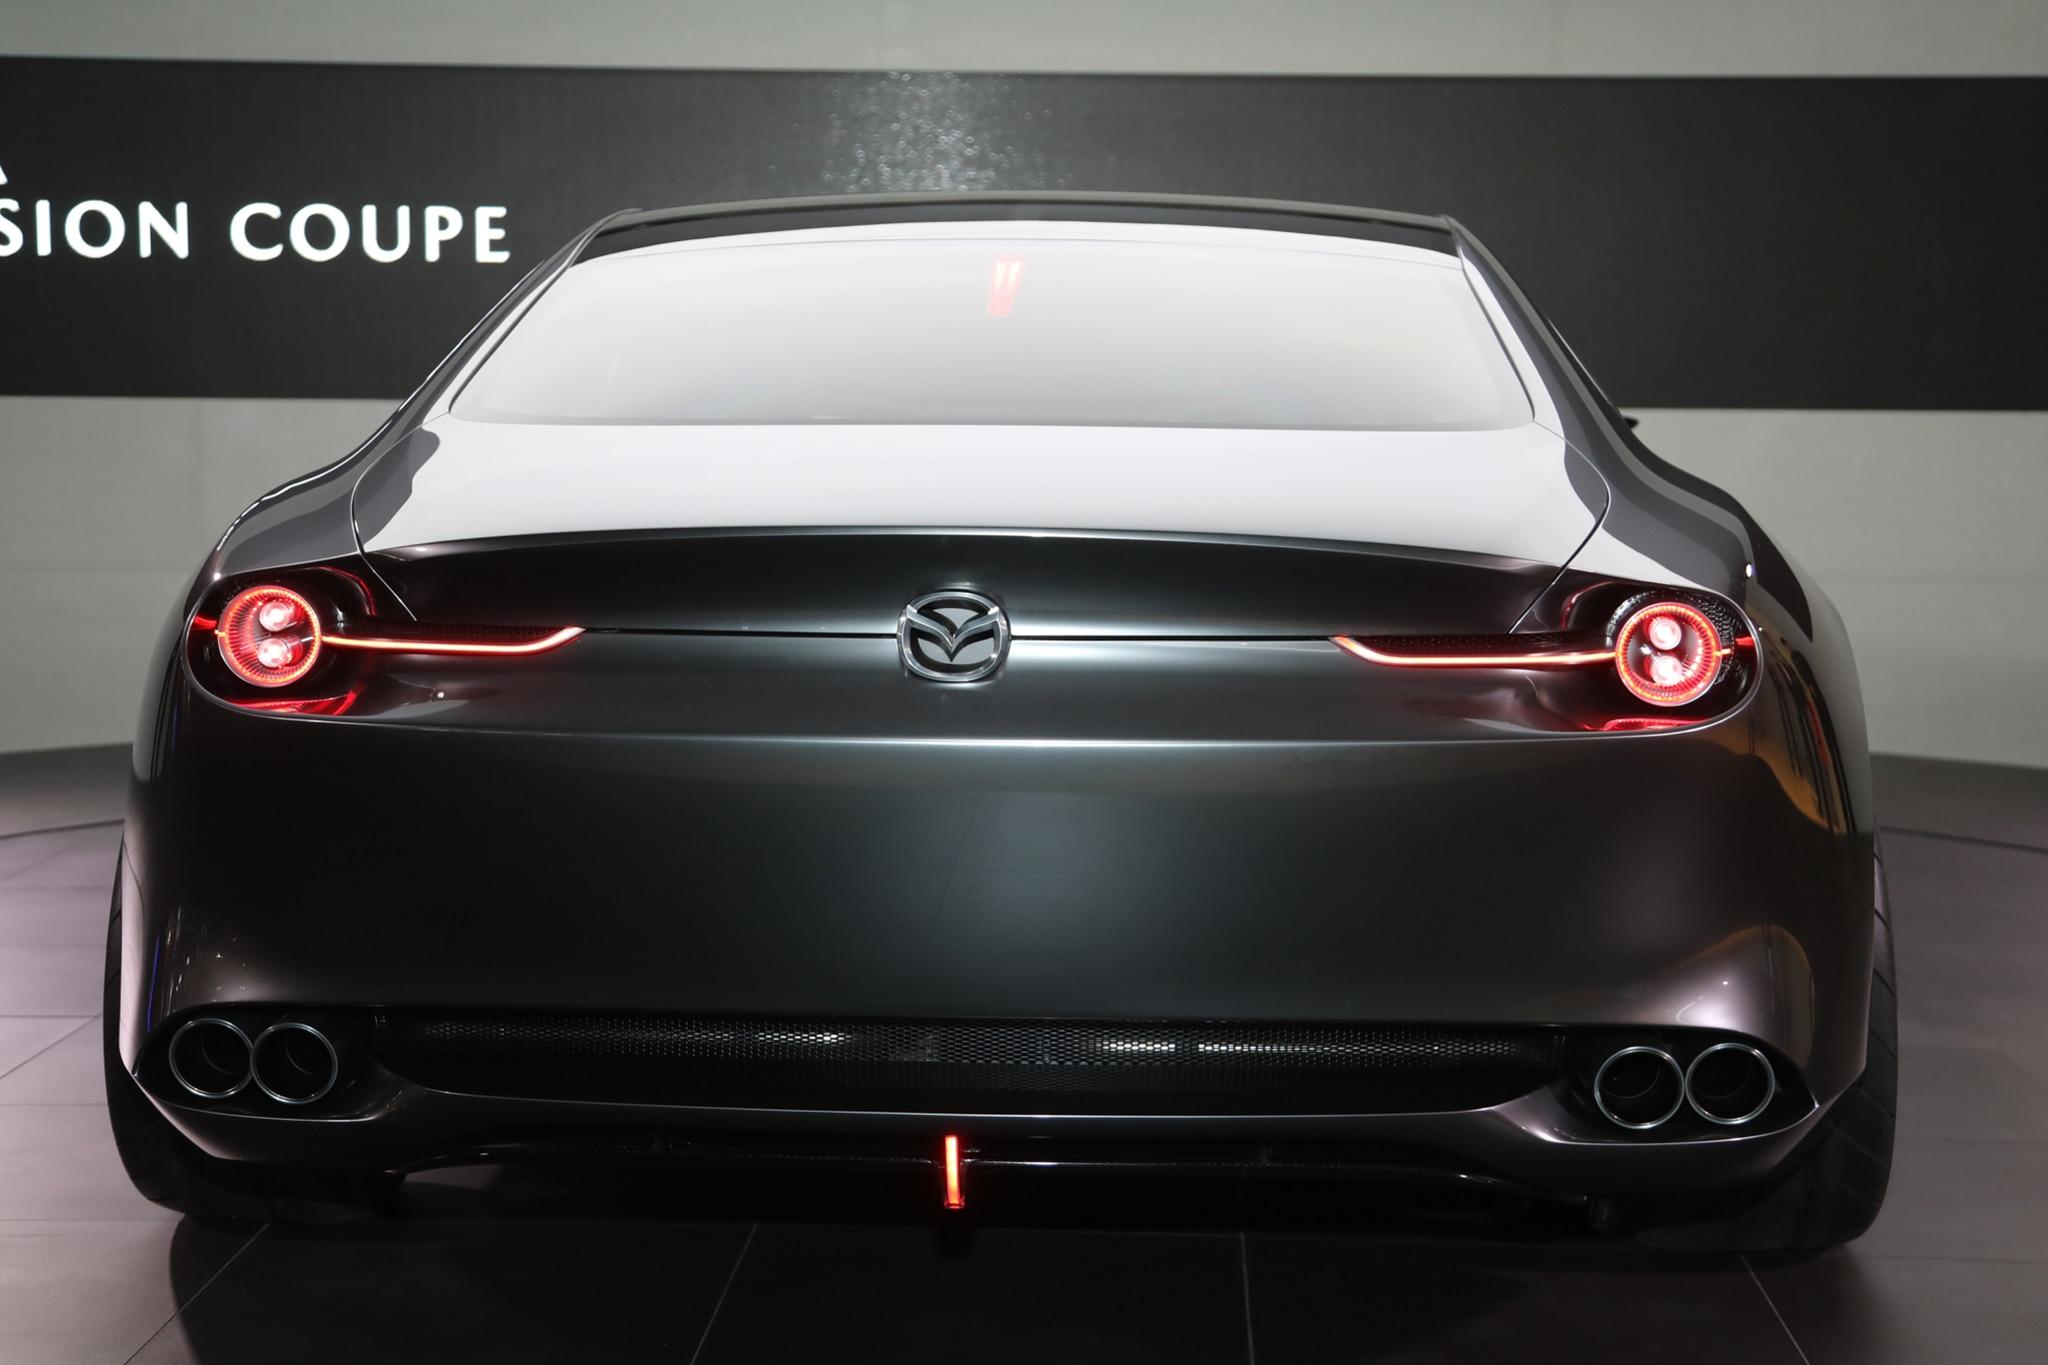 https://st.automobilemag.com/uploads/sites/11/2017/10/Mazda-Vision-Coupe-concept-rear.jpg